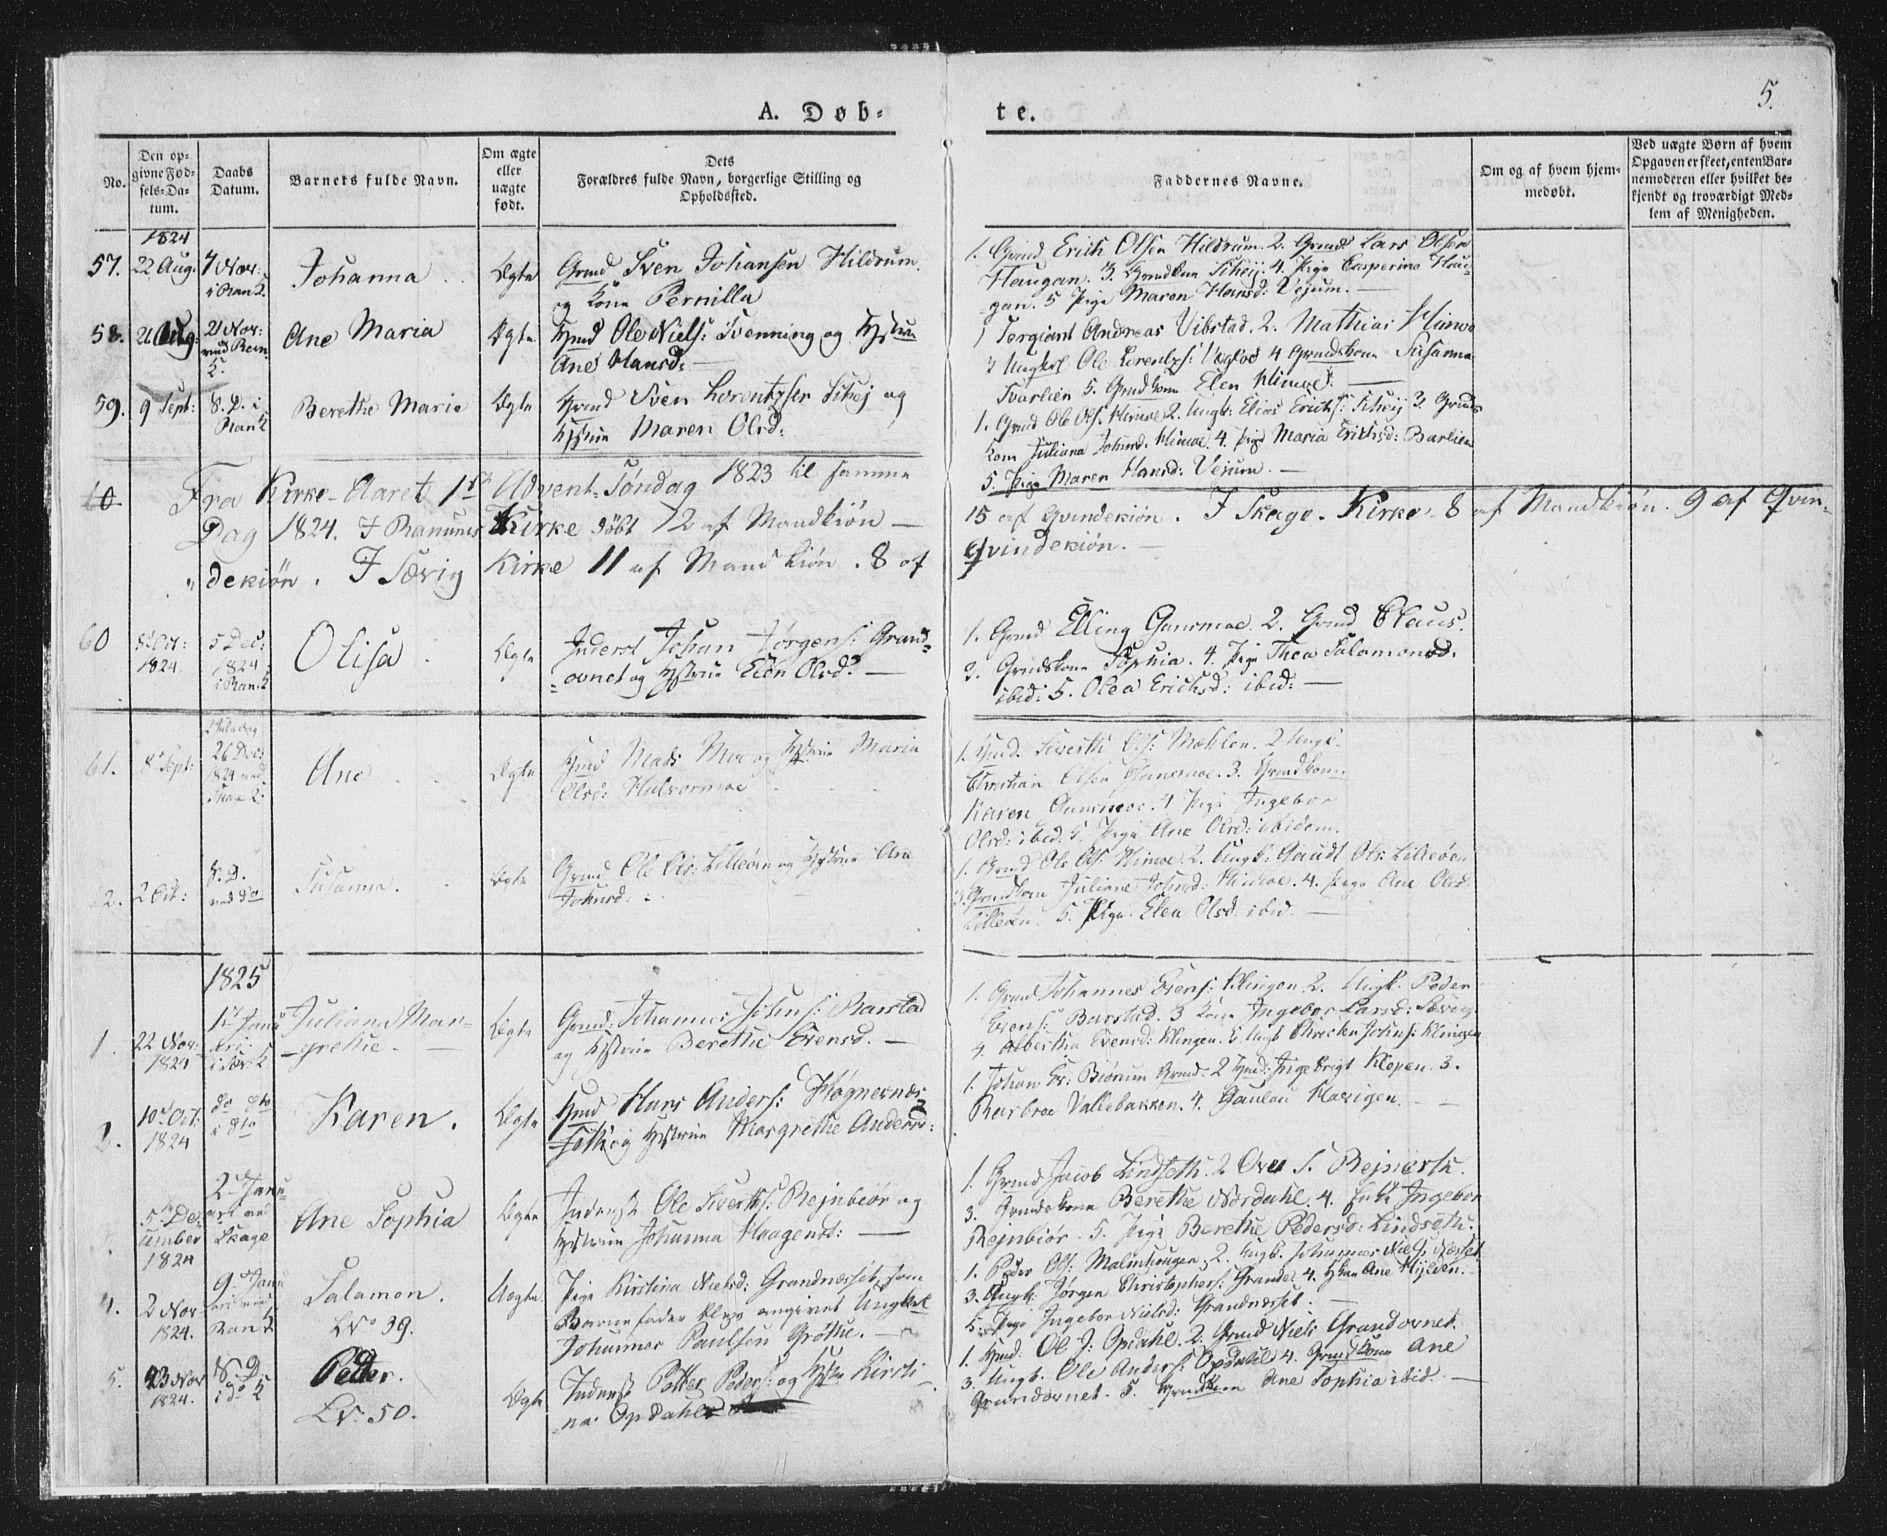 SAT, Ministerialprotokoller, klokkerbøker og fødselsregistre - Nord-Trøndelag, 764/L0551: Ministerialbok nr. 764A07a, 1824-1864, s. 5